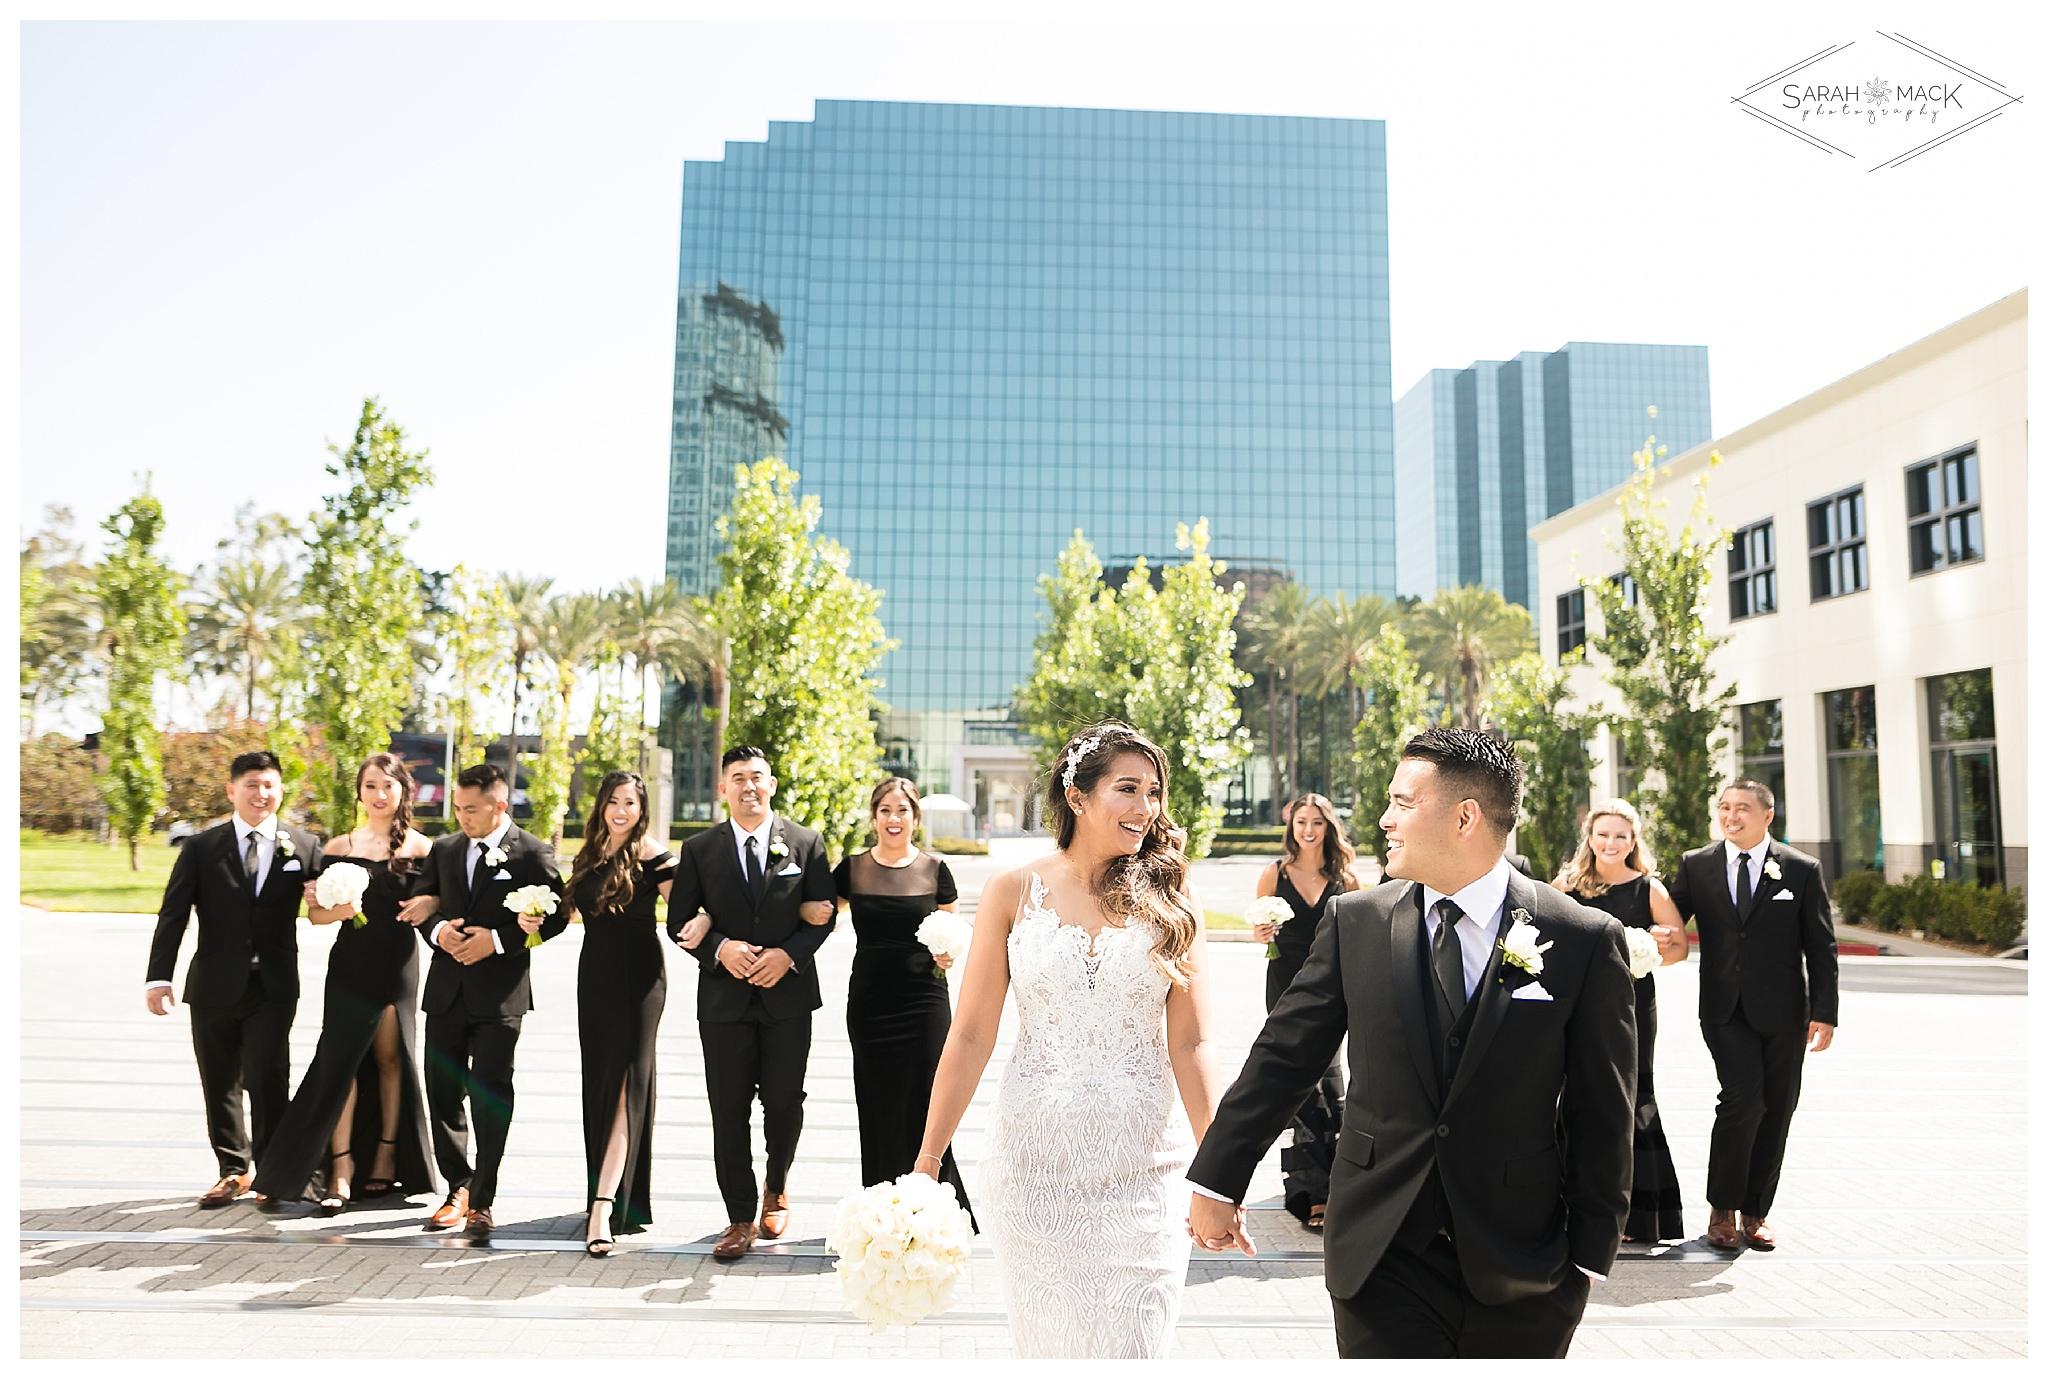 LE-Avenue-of-the-Arts-Costa-Mesa-Wedding-Photography-0092.jpg